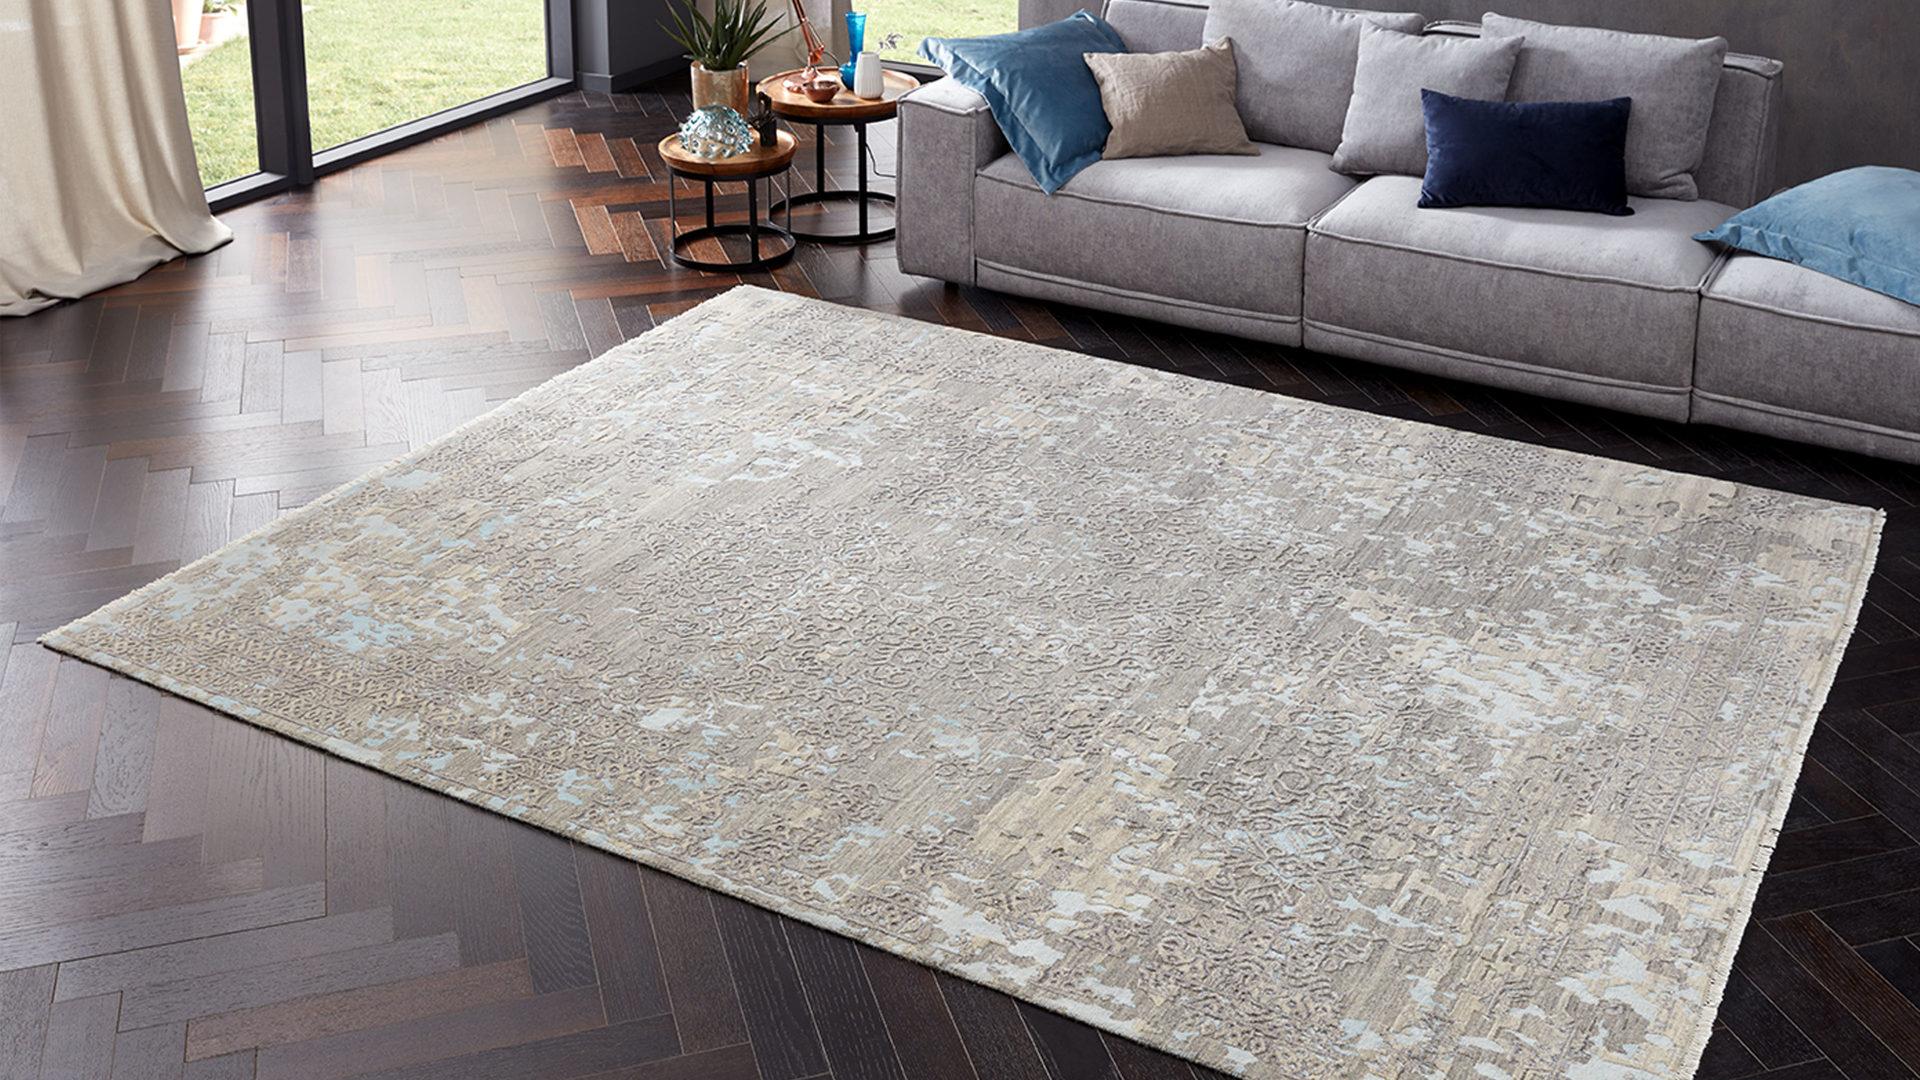 Interliving Teppich Serie T-8350, Beige-Grau gemustert – ca. 140 x 200 cm